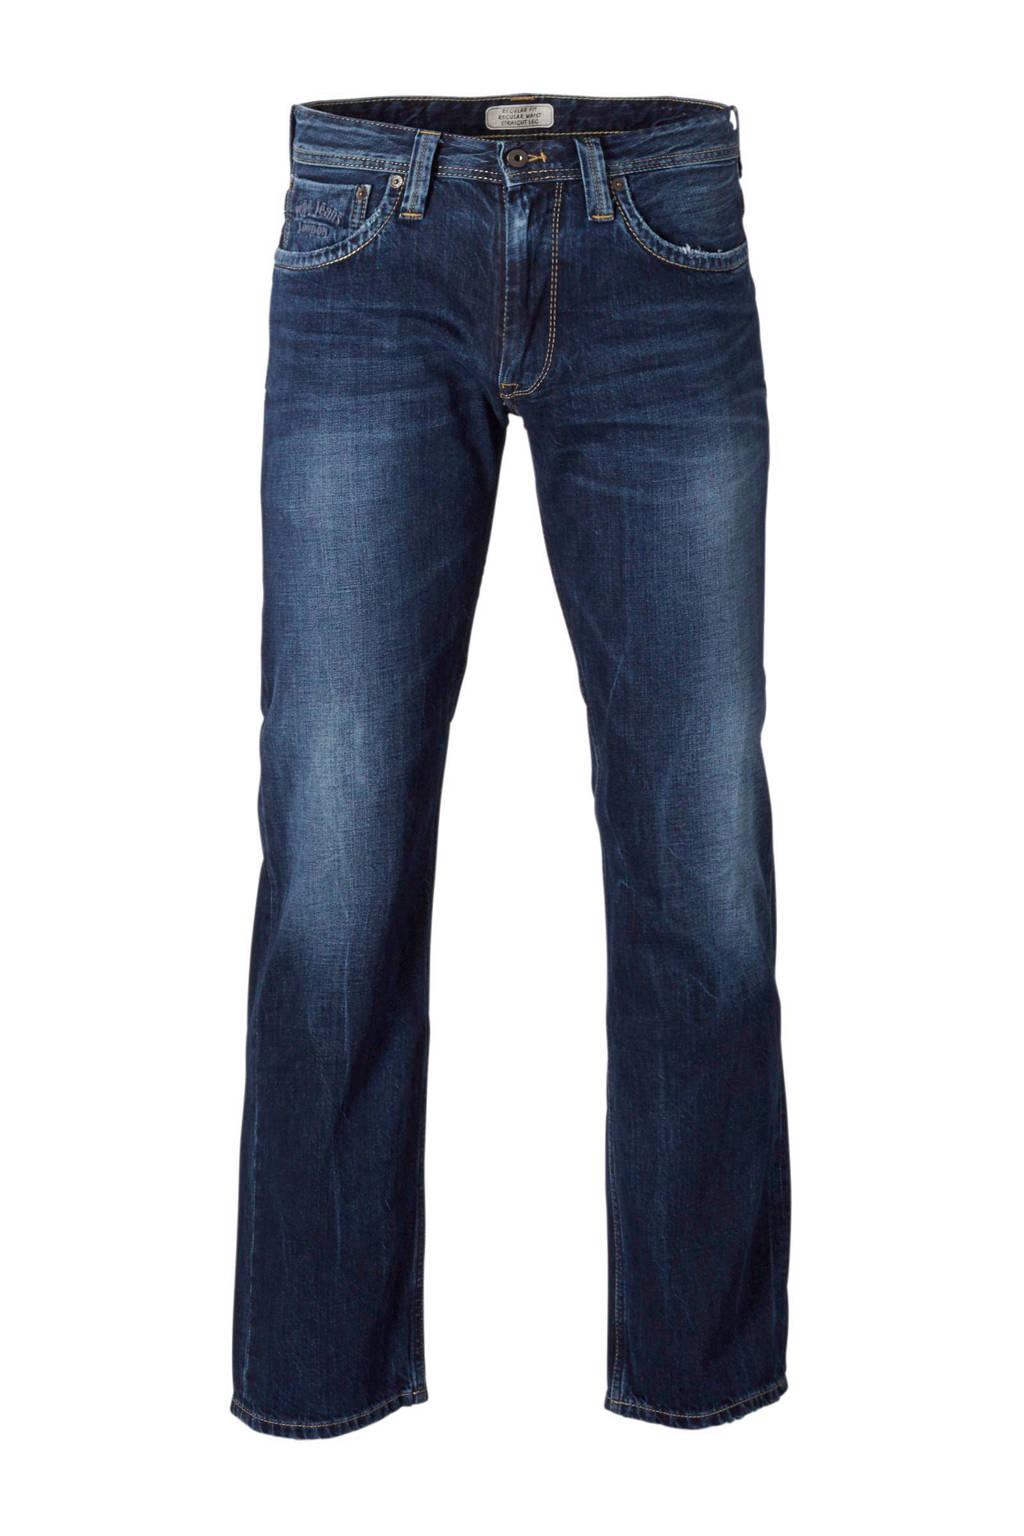 Pepe Jeans regular fit jeans Kingston dark used, Dark used